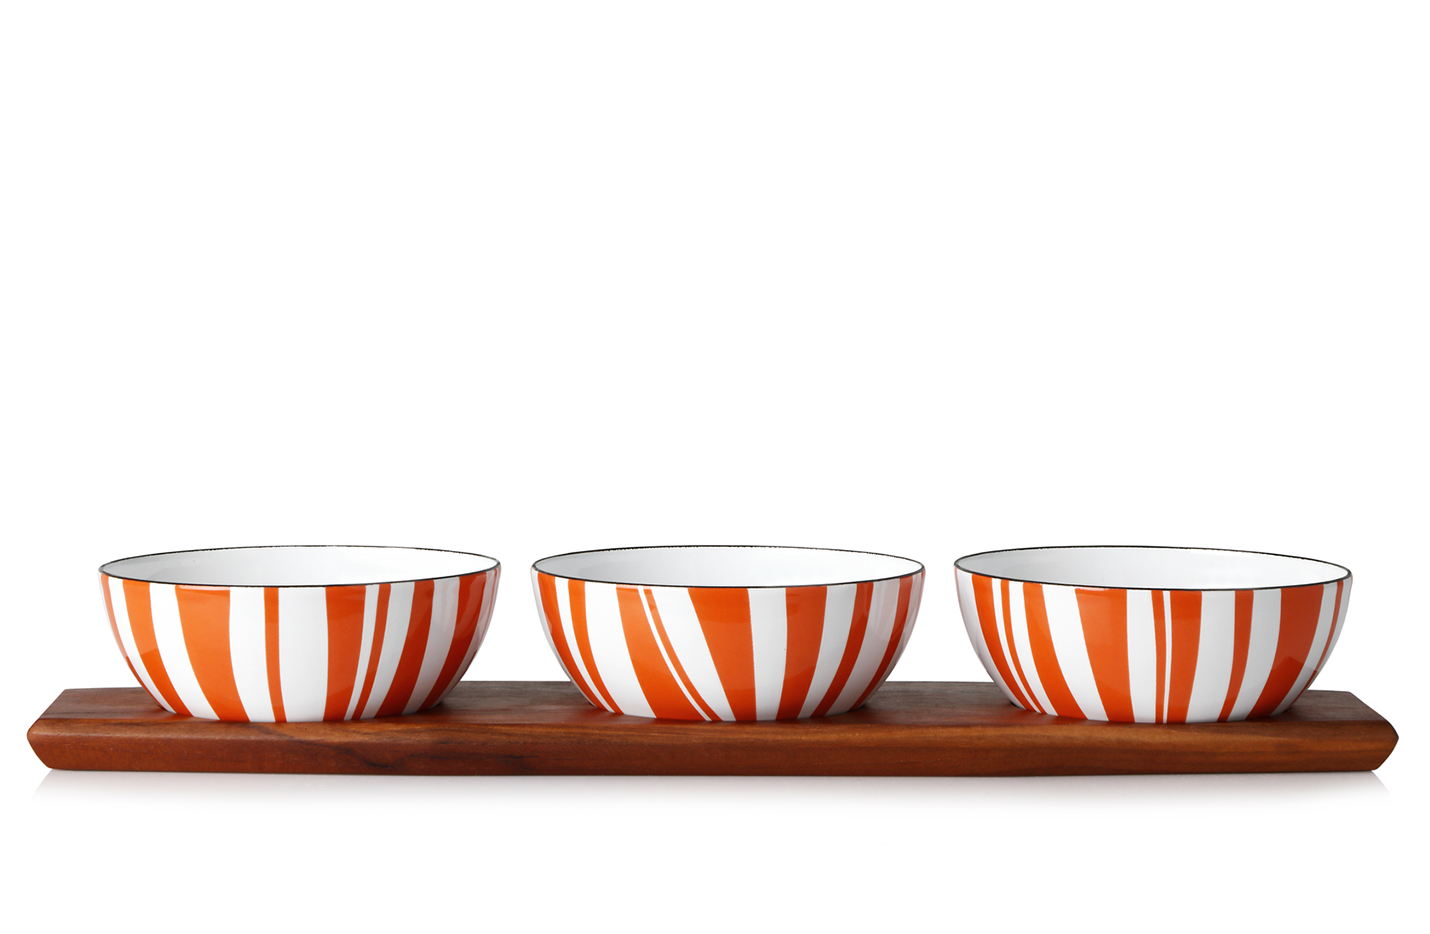 Snackset - 3 pcs bowls (10cm) orange + tray